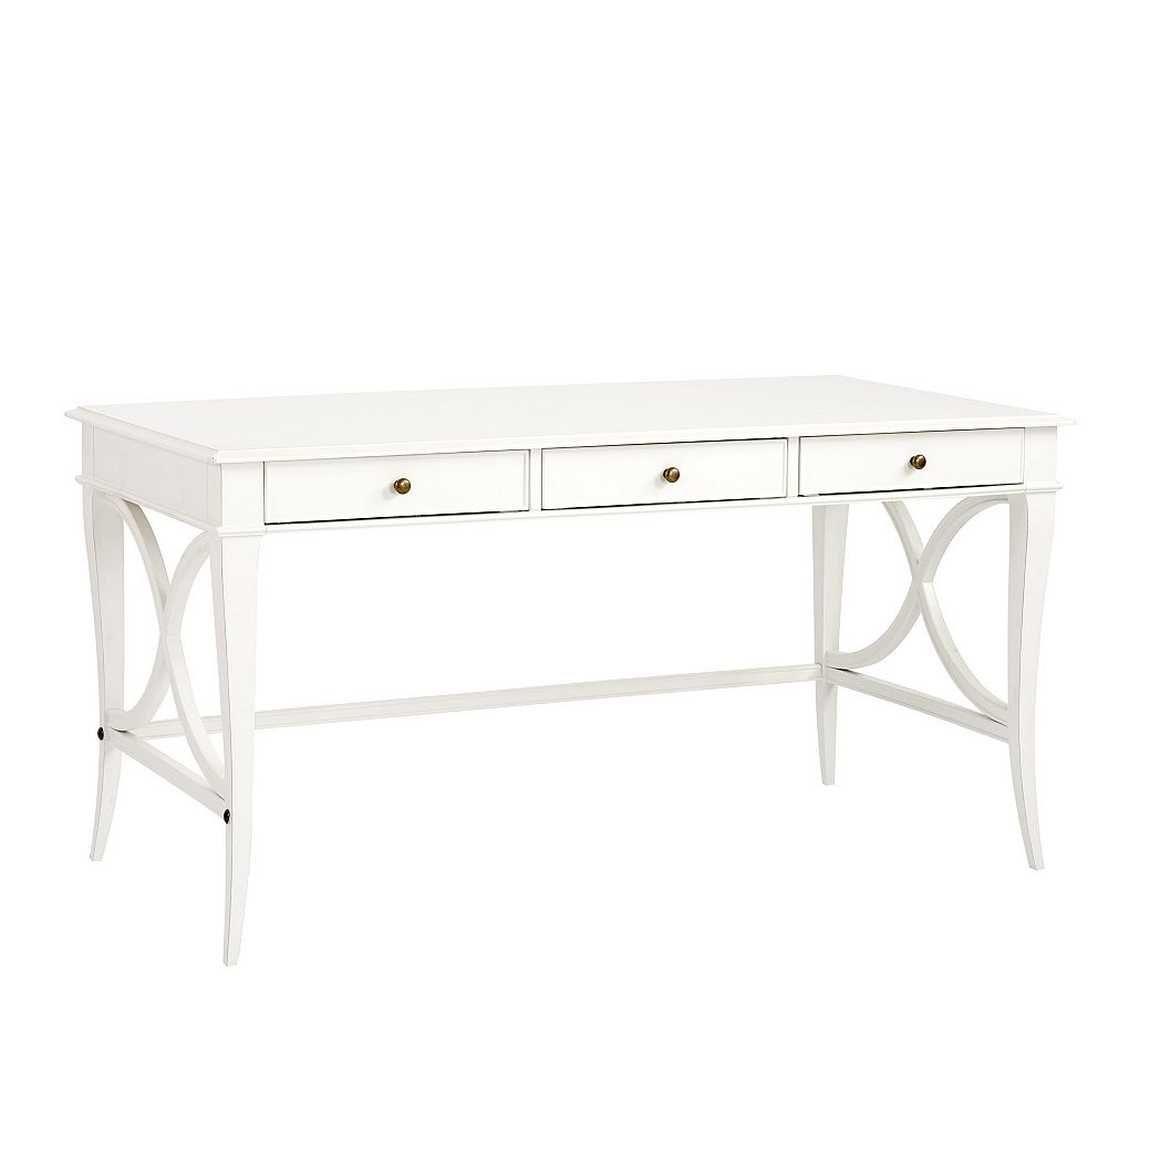 Kelley Desk Ballard Designs Desk Simple Closet Ballard Designs